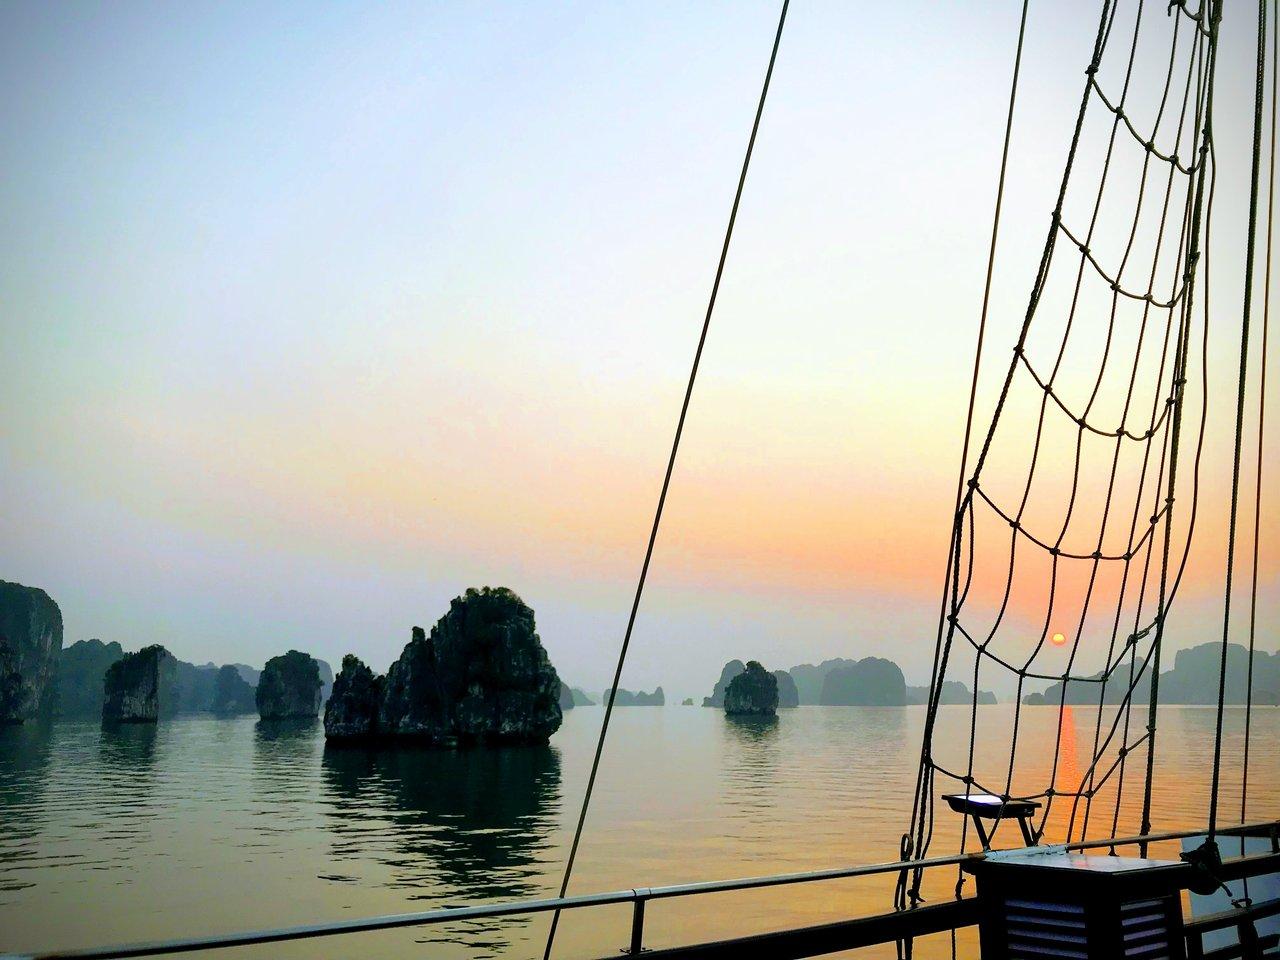 Sunset   Photo taken by Seng Aung S